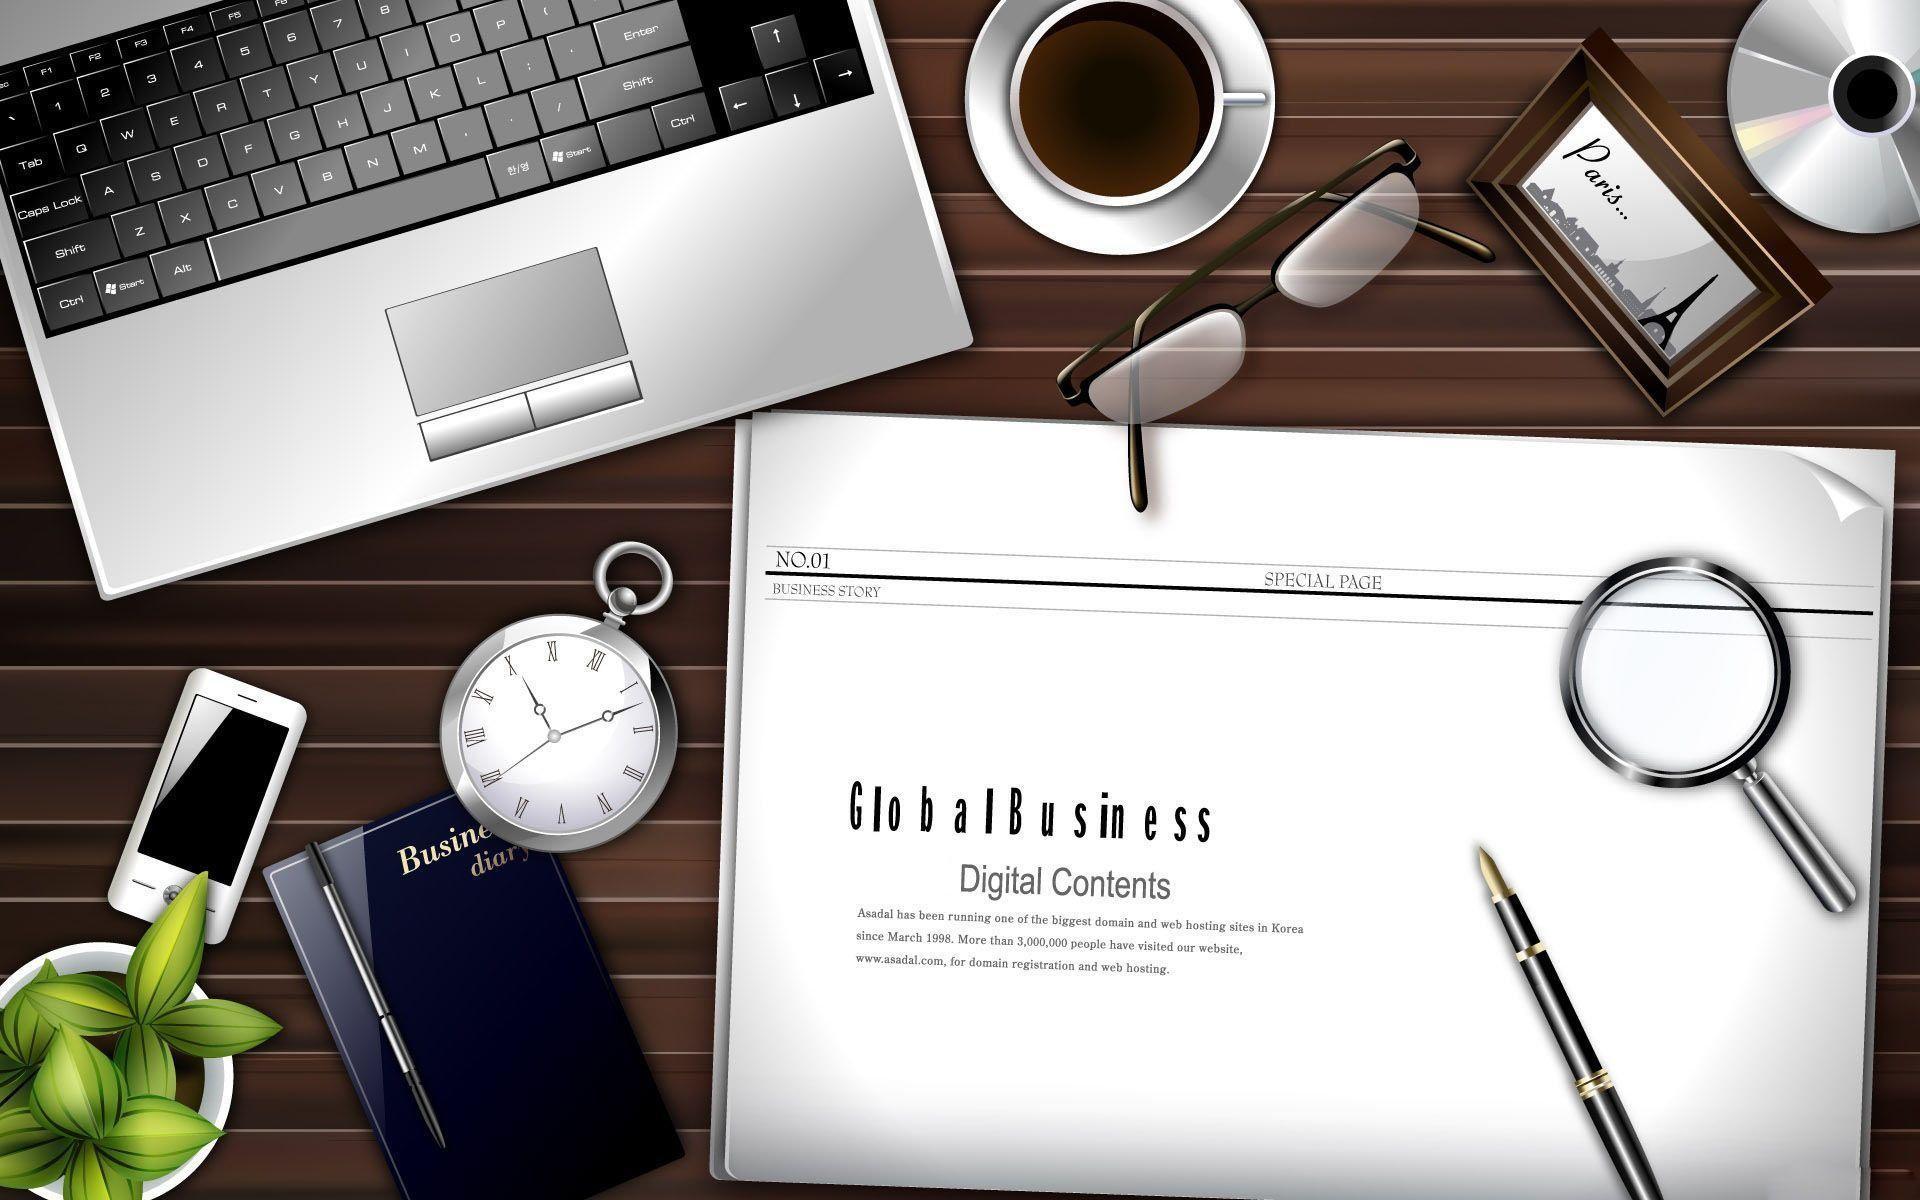 Office Desktop Backgrounds For Free | Wallpaper in Pixels